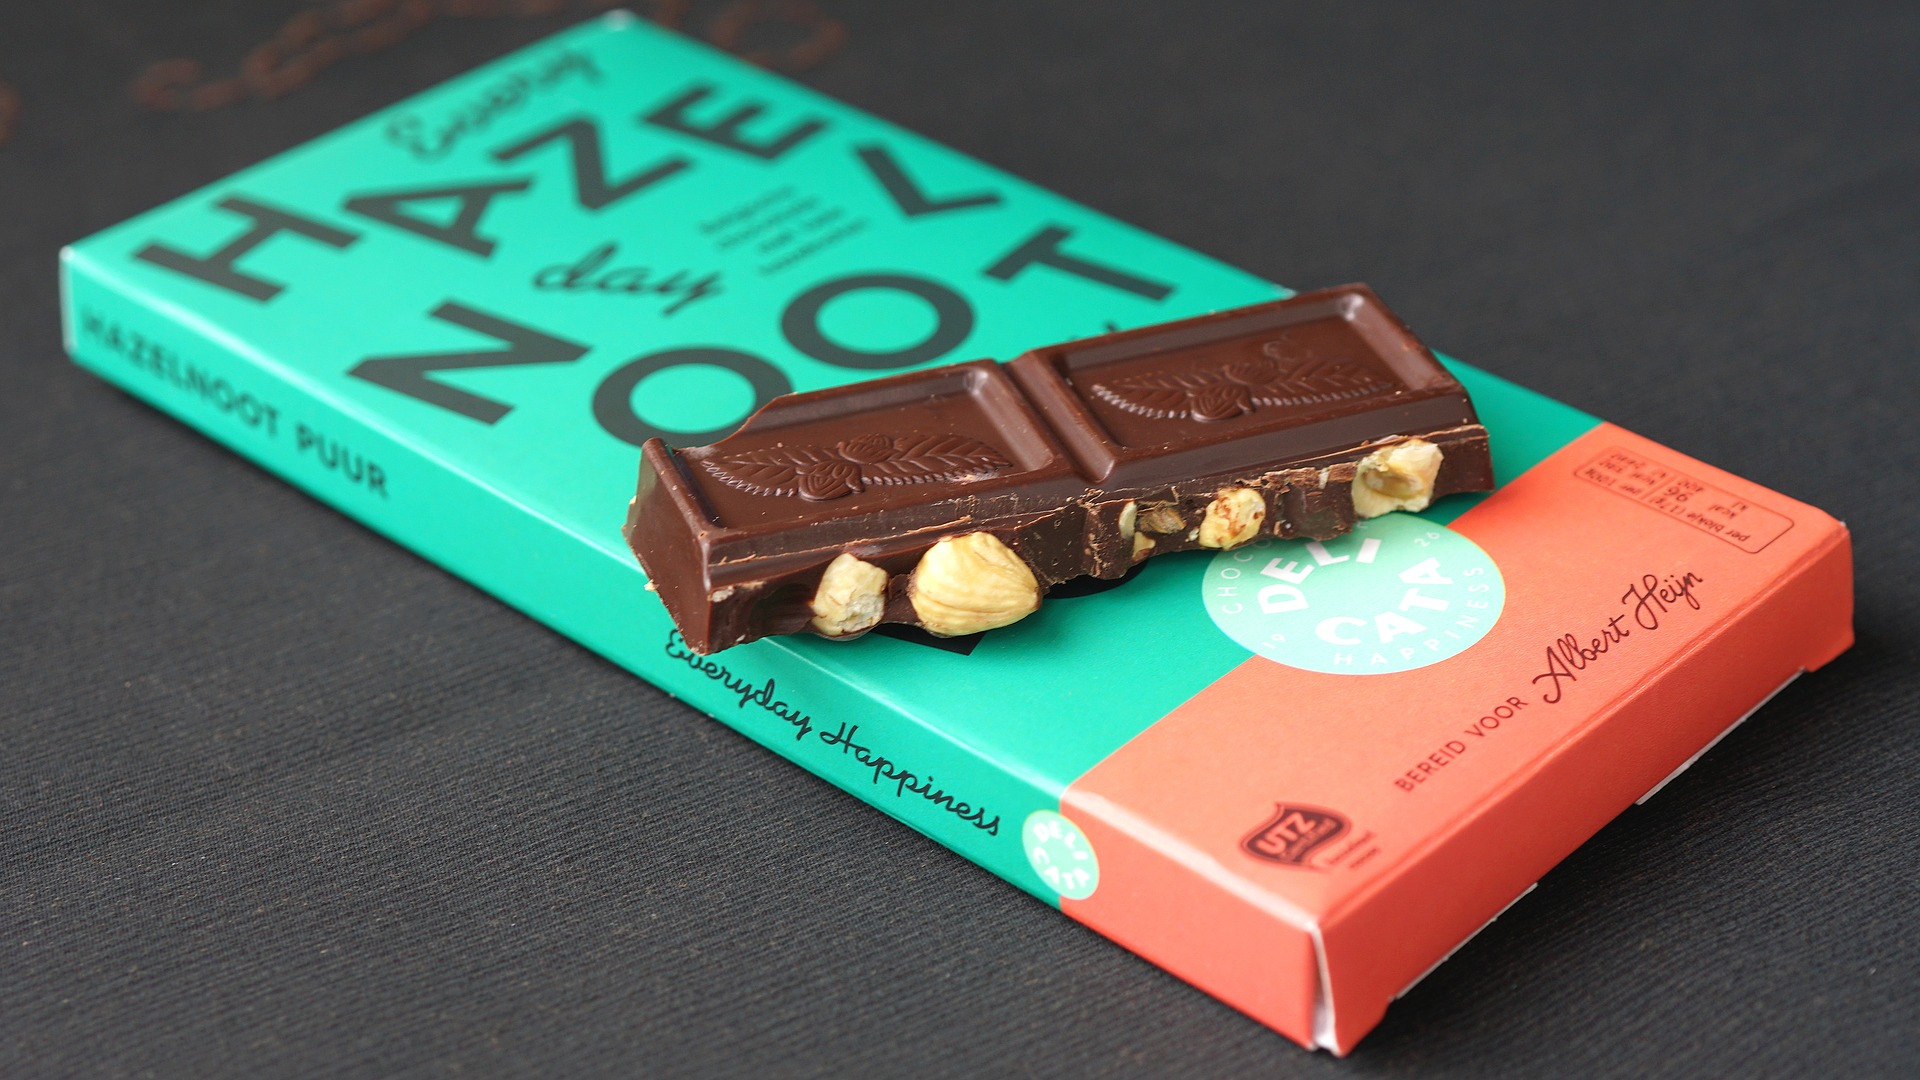 Ebenholz Dunkle Kopf Schokolade Bitterschokolade